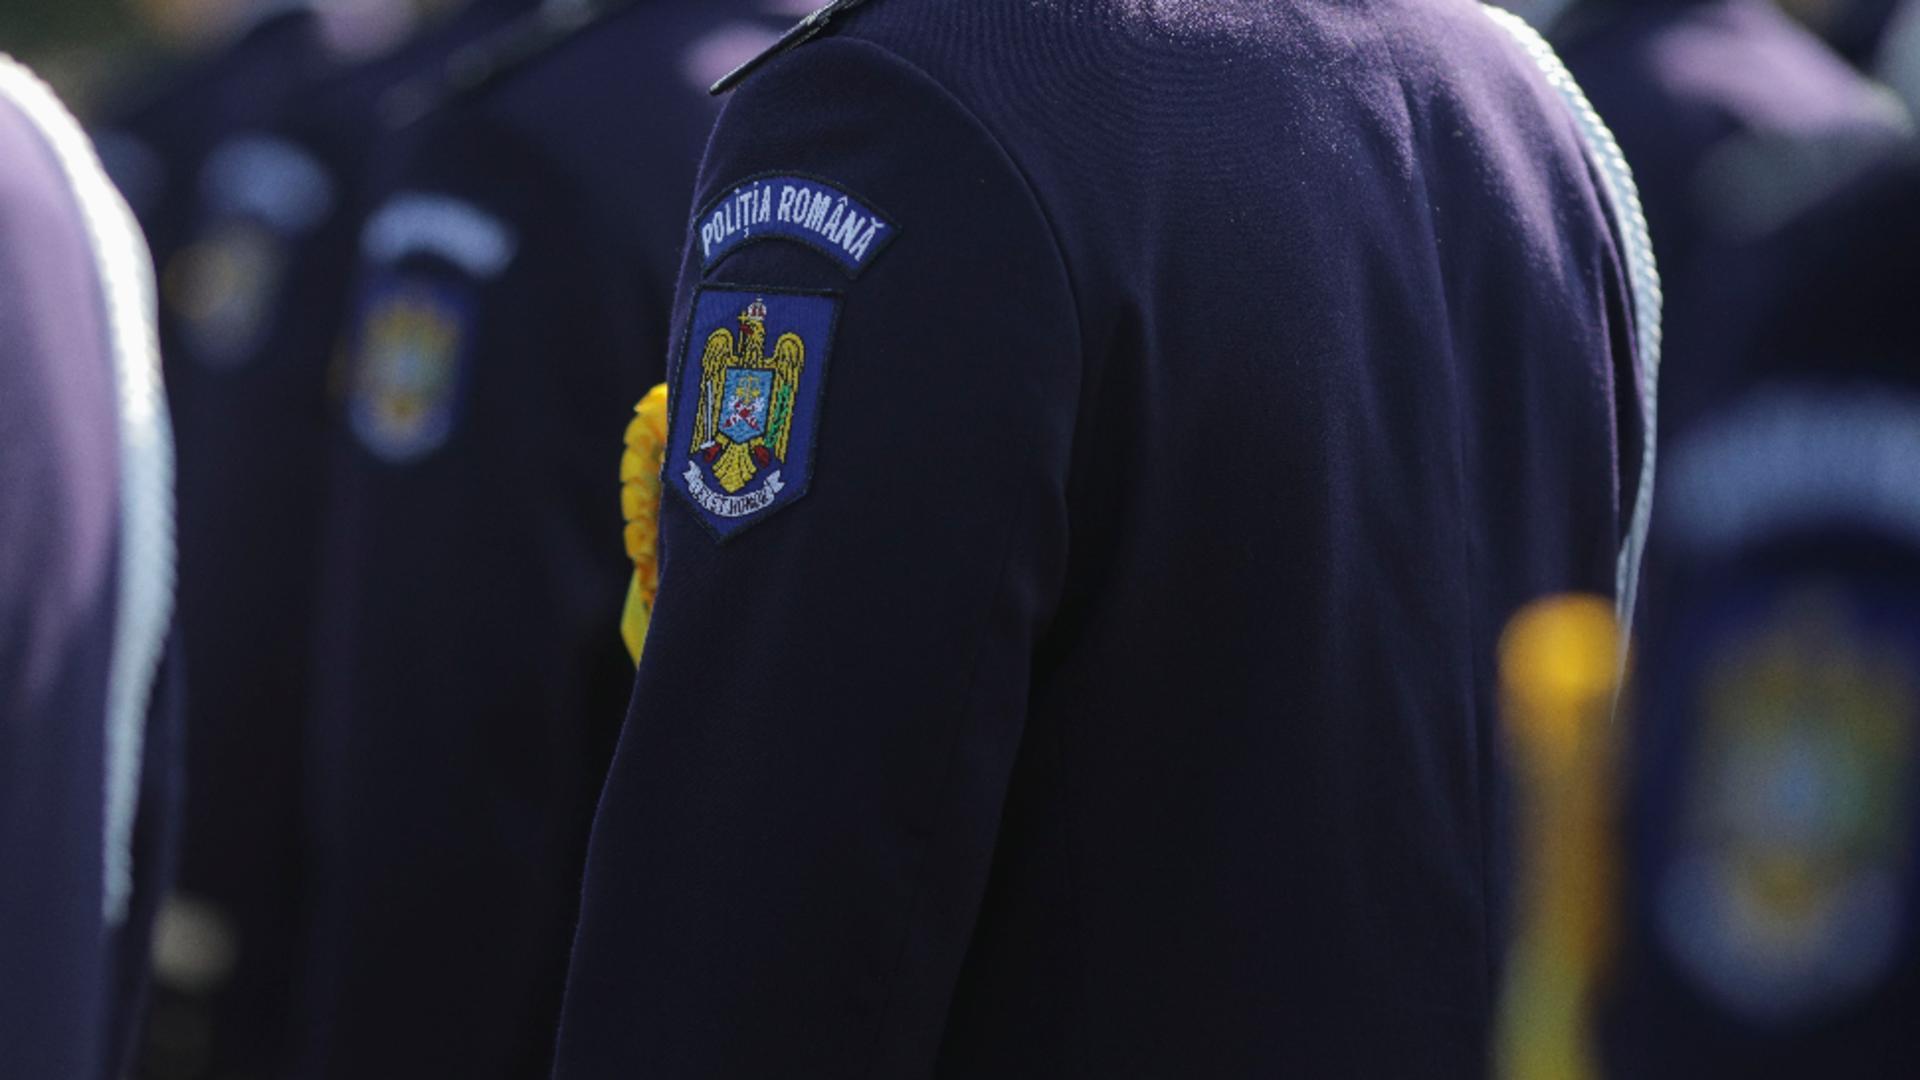 Trei dintre polițiștii care au torturat doi bărbați au fost arestați preventiv / Foto: Inquam Photos, Octav Ganea